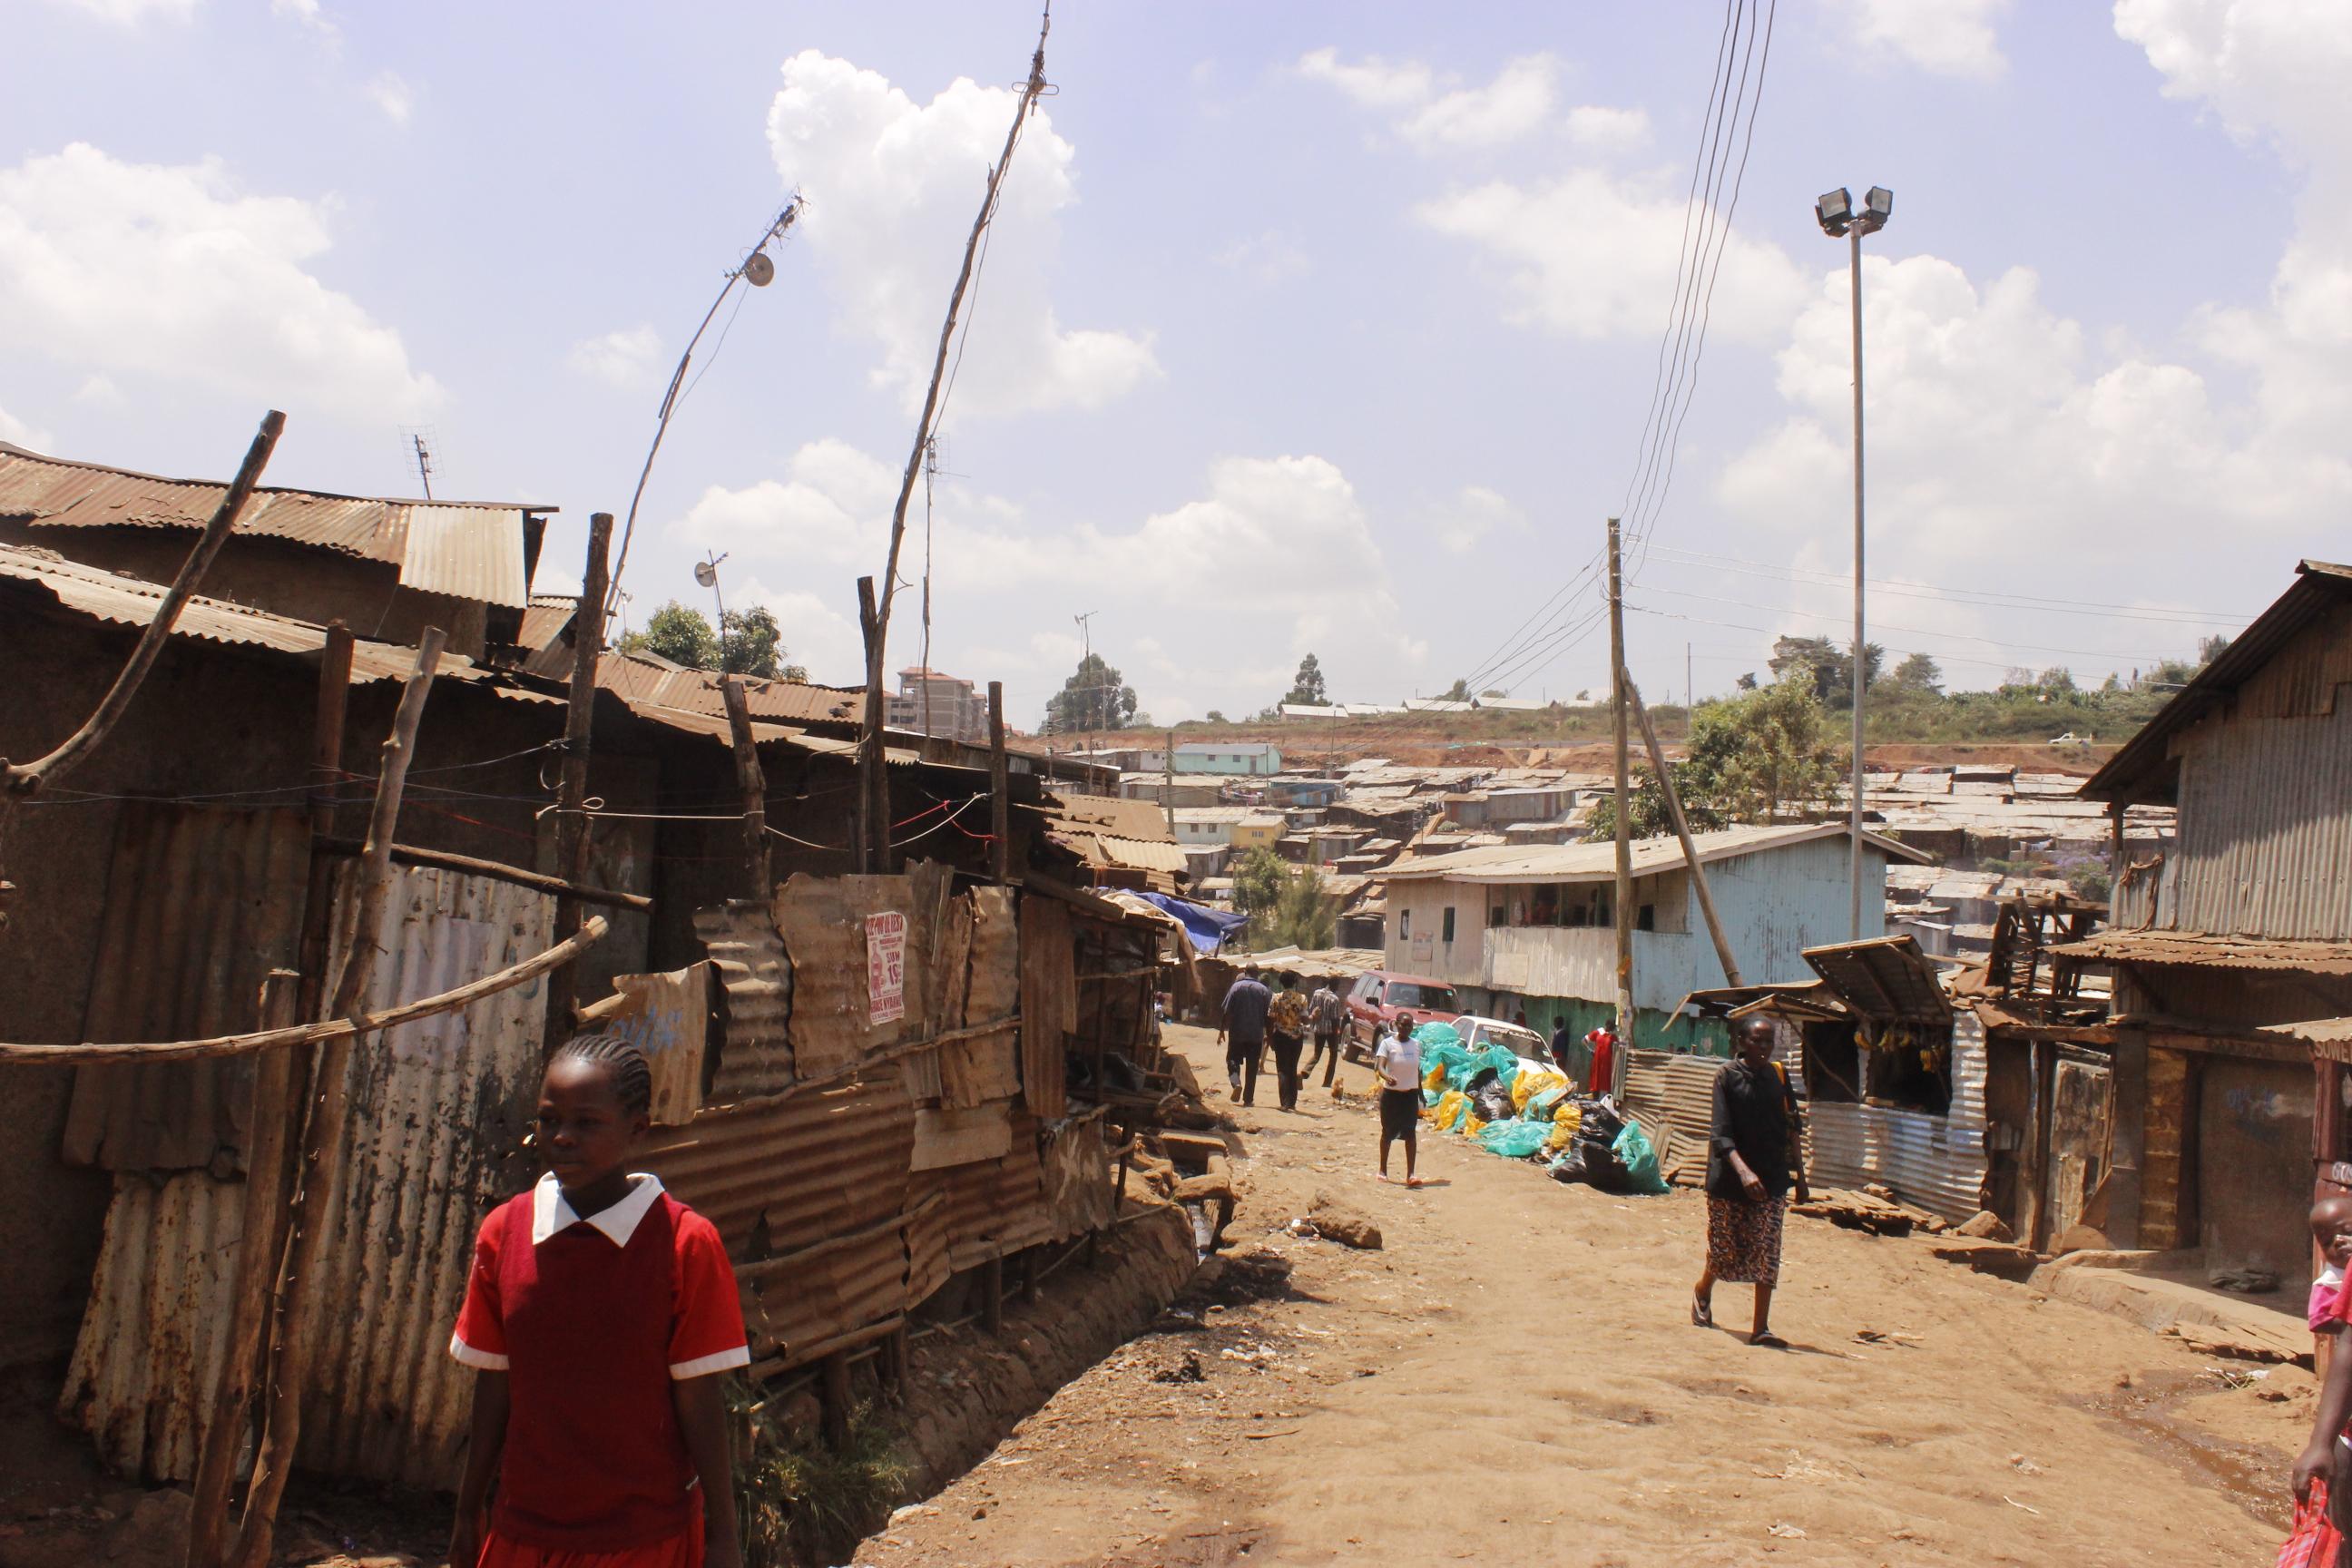 Houses in Kibera Slum, Nairobi, Kenya